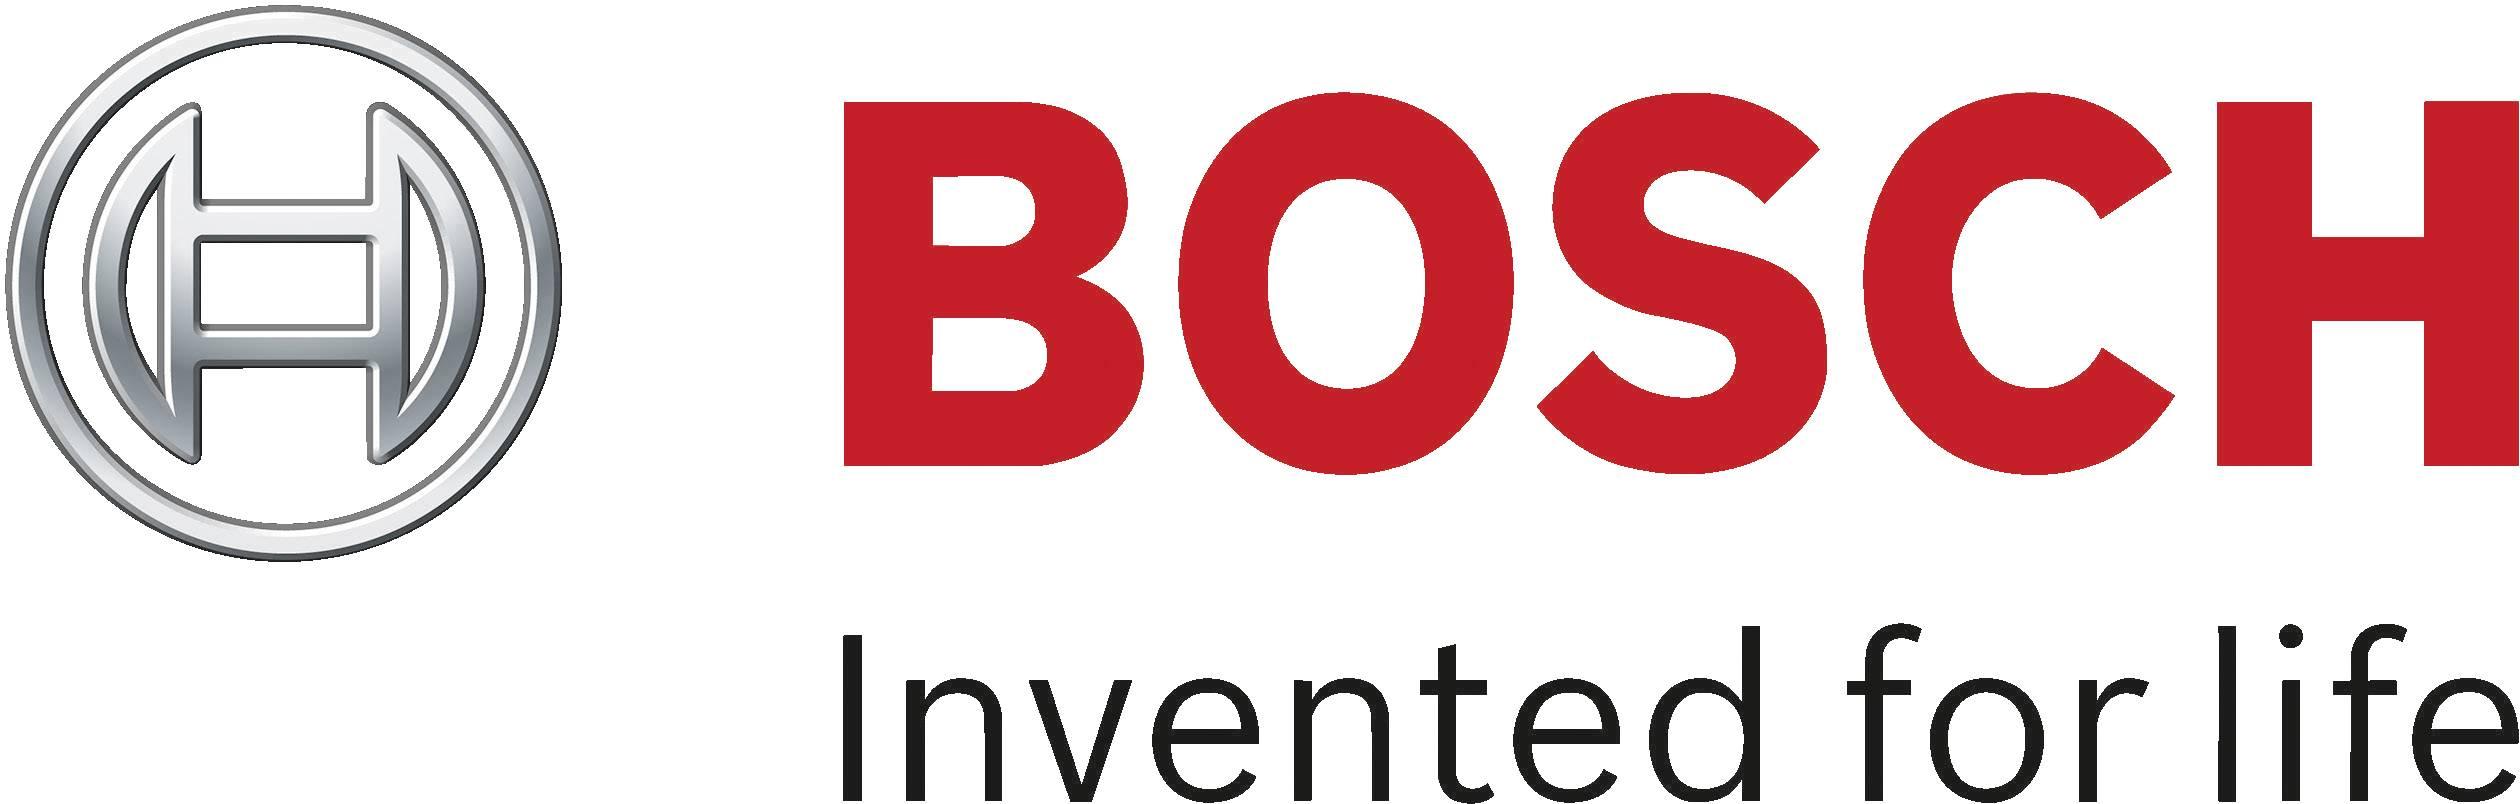 Bosch Home and Garden ALB 18 akumulator 06008A0501 ALB 18 puhalica za lišće uklj. akumulator 18 V